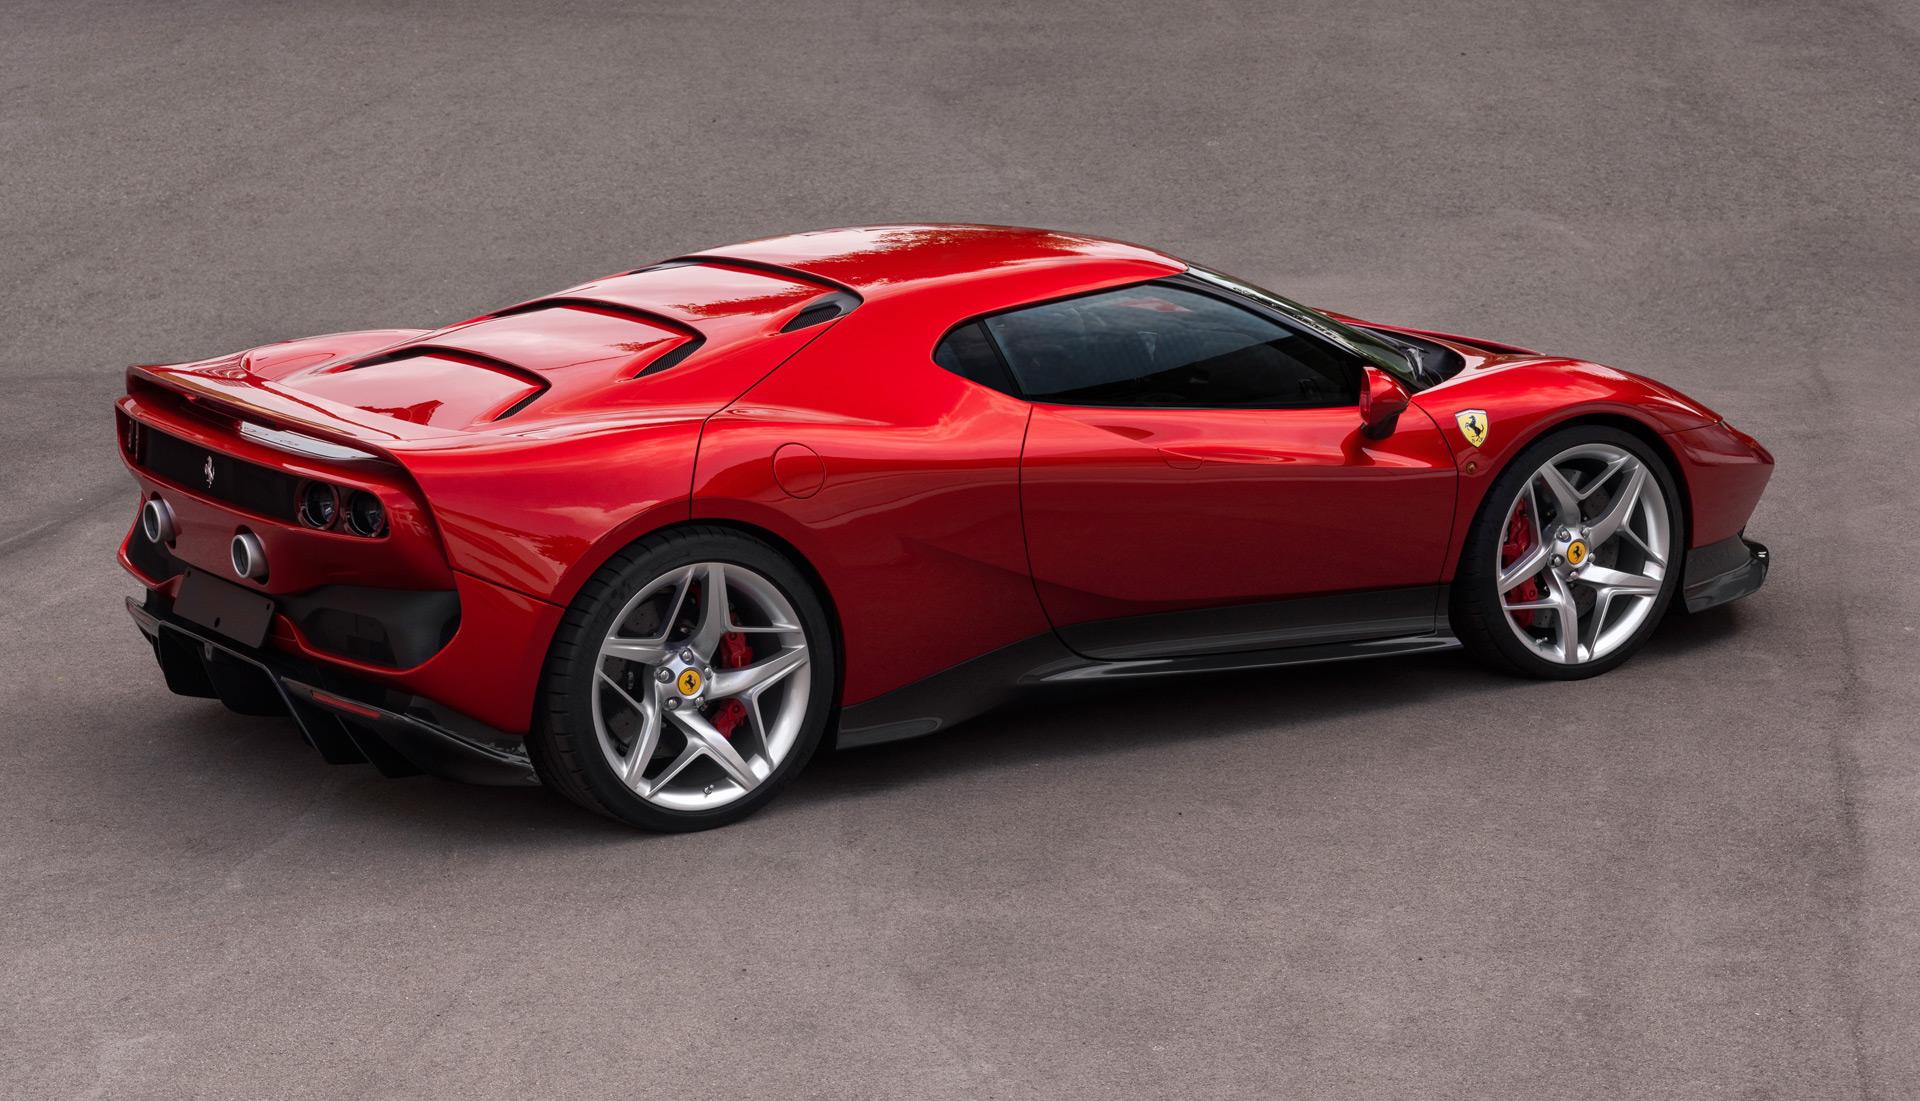 ferrari sp38, 2017 ford gt, 2018 porsche 911 carrera t: car news